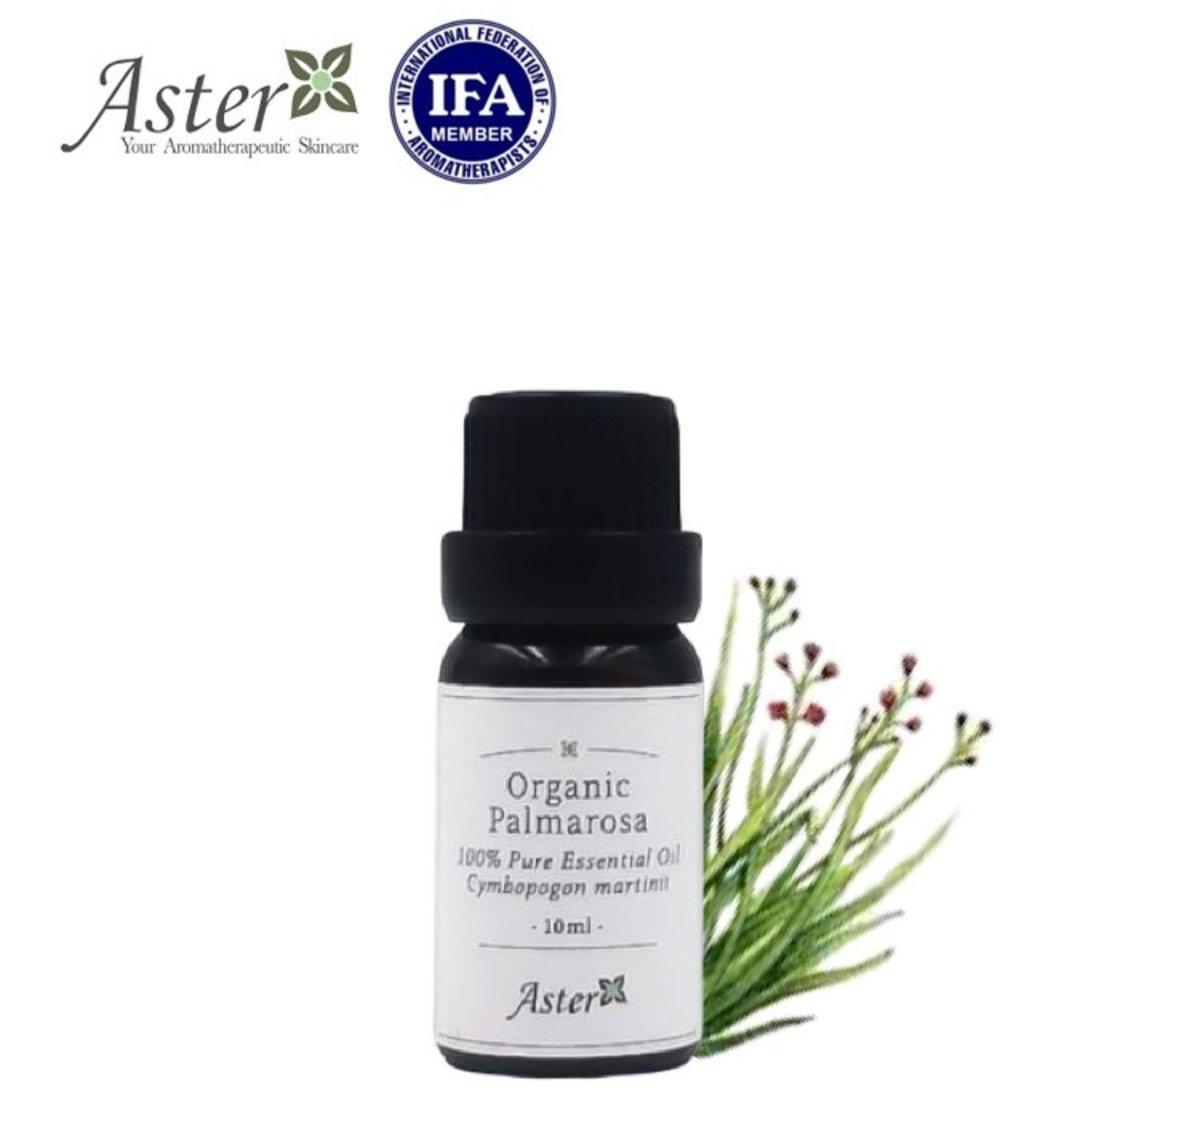 Organic Palmarosa Essential Oil (Cymbopogon martini) - 10ml